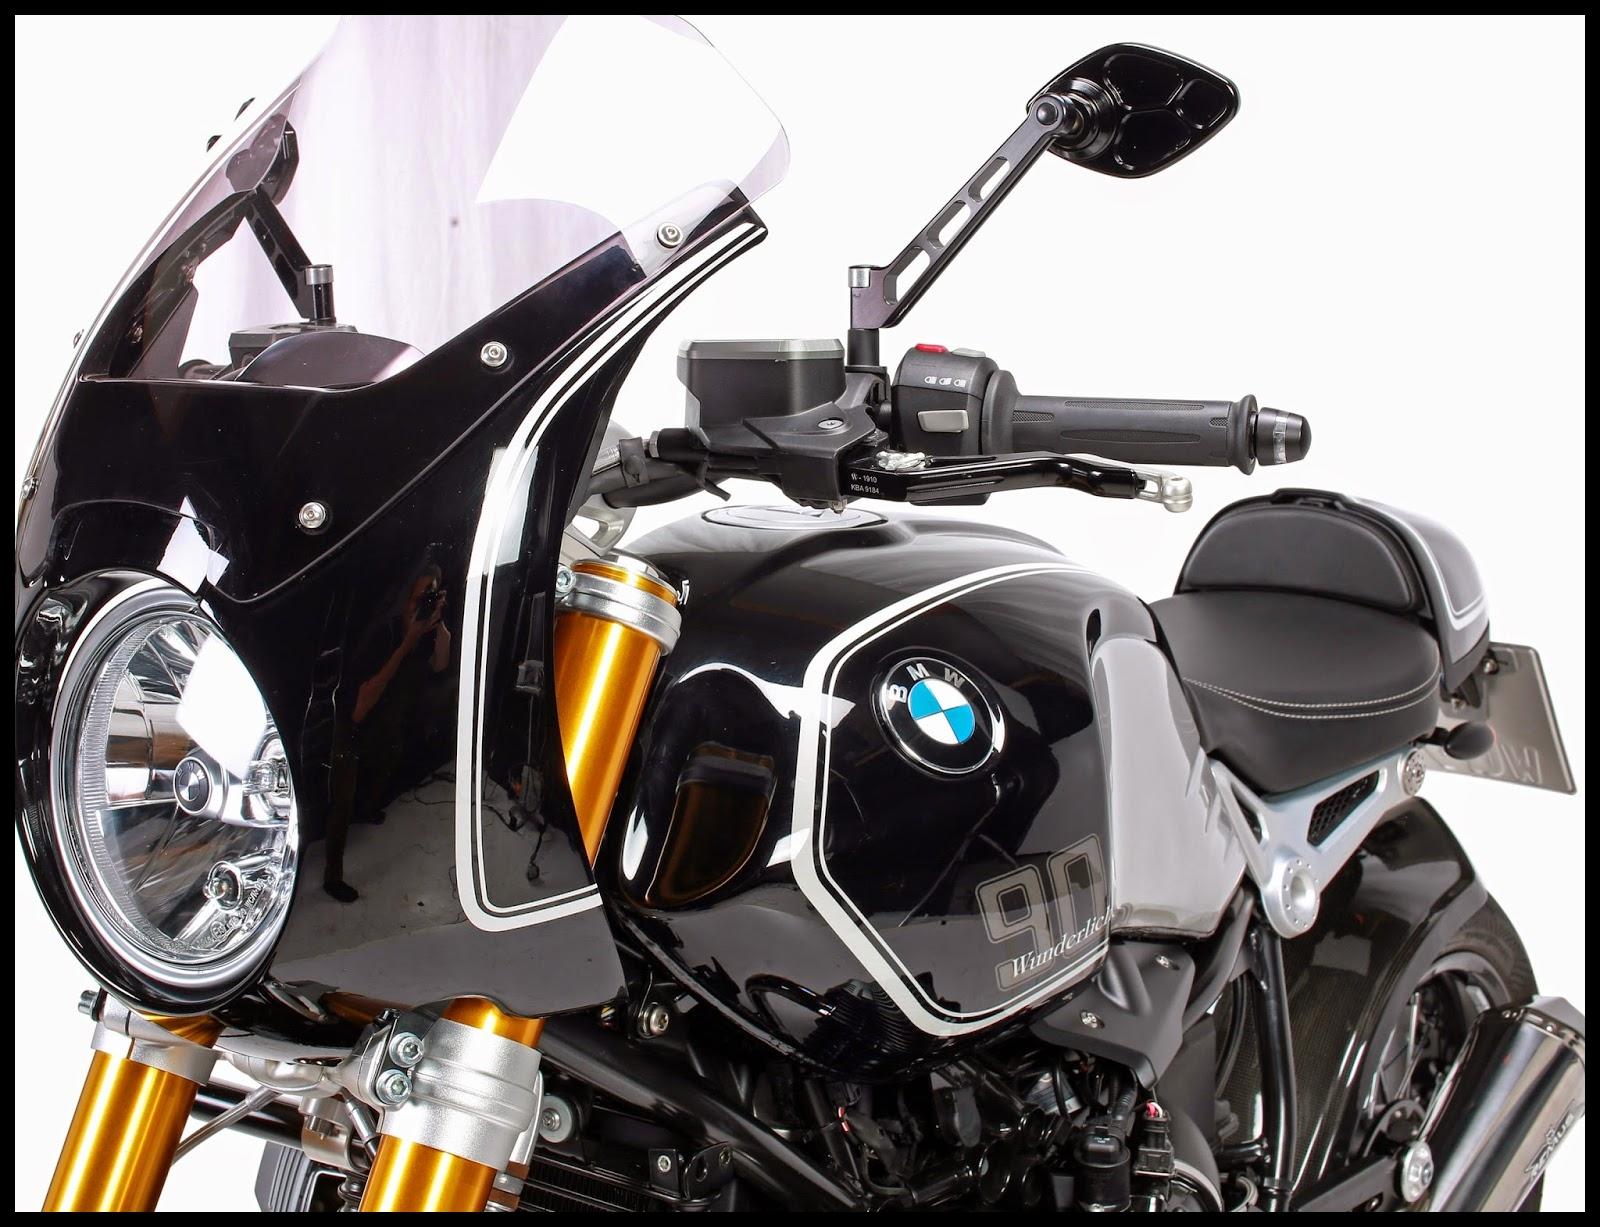 New BMW R nineT Daytona fairing from Wunderlich